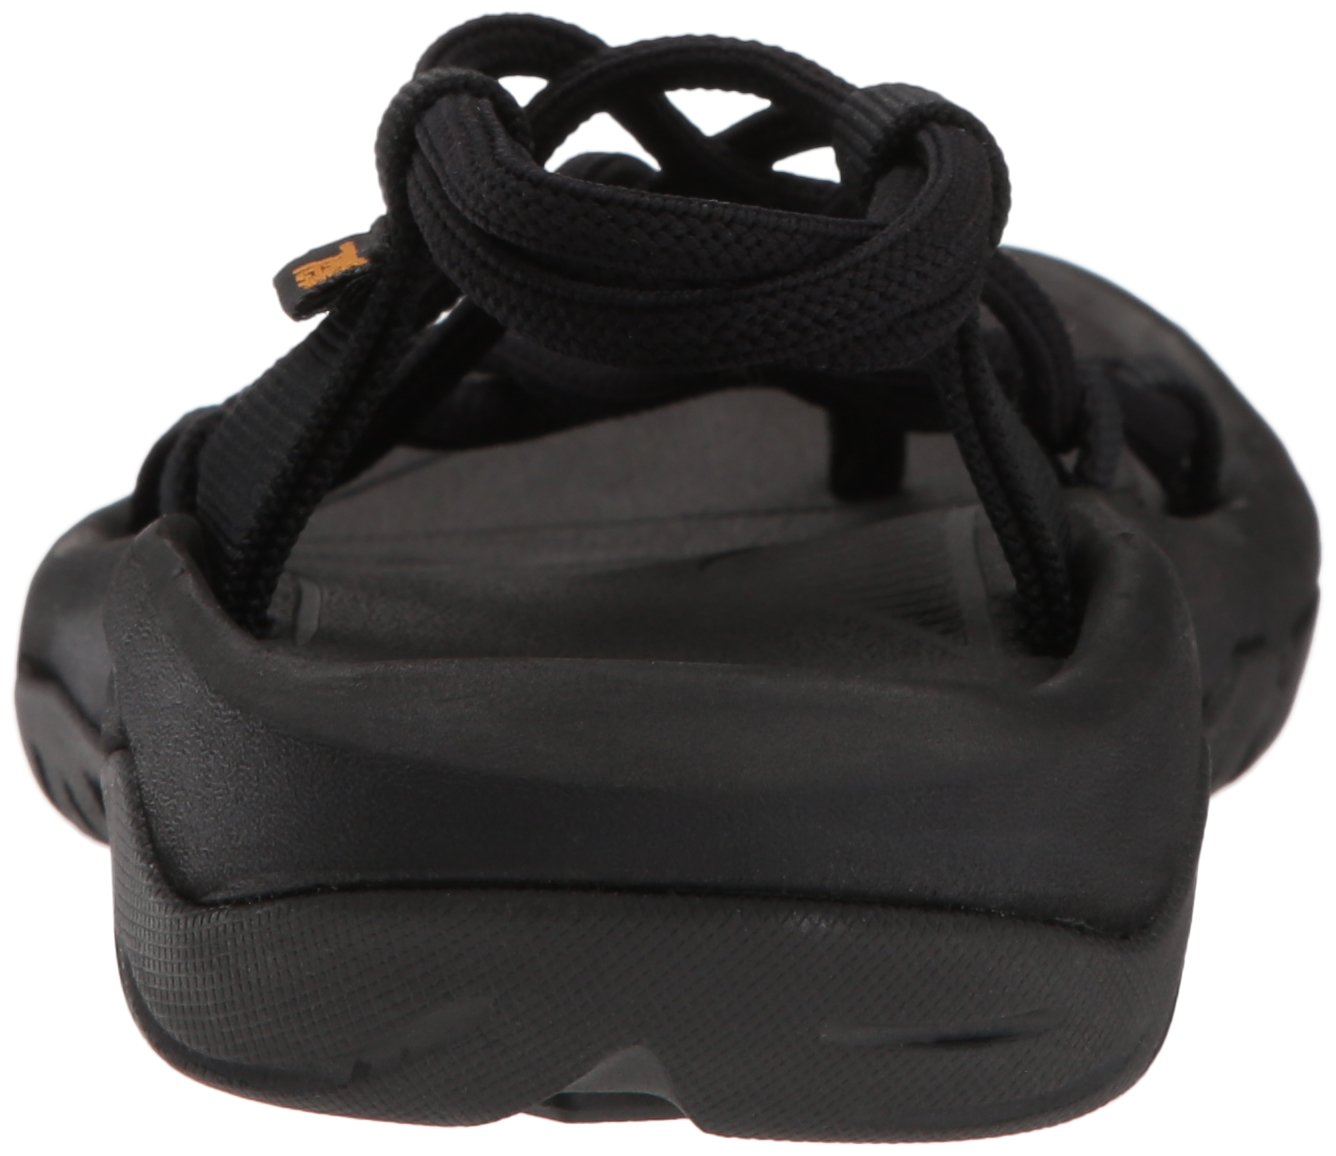 Teva Women's W 39 Hurricane XLT Infinity Sport Sandal B07DHM2B1F 39 W M EU|Black f2275a